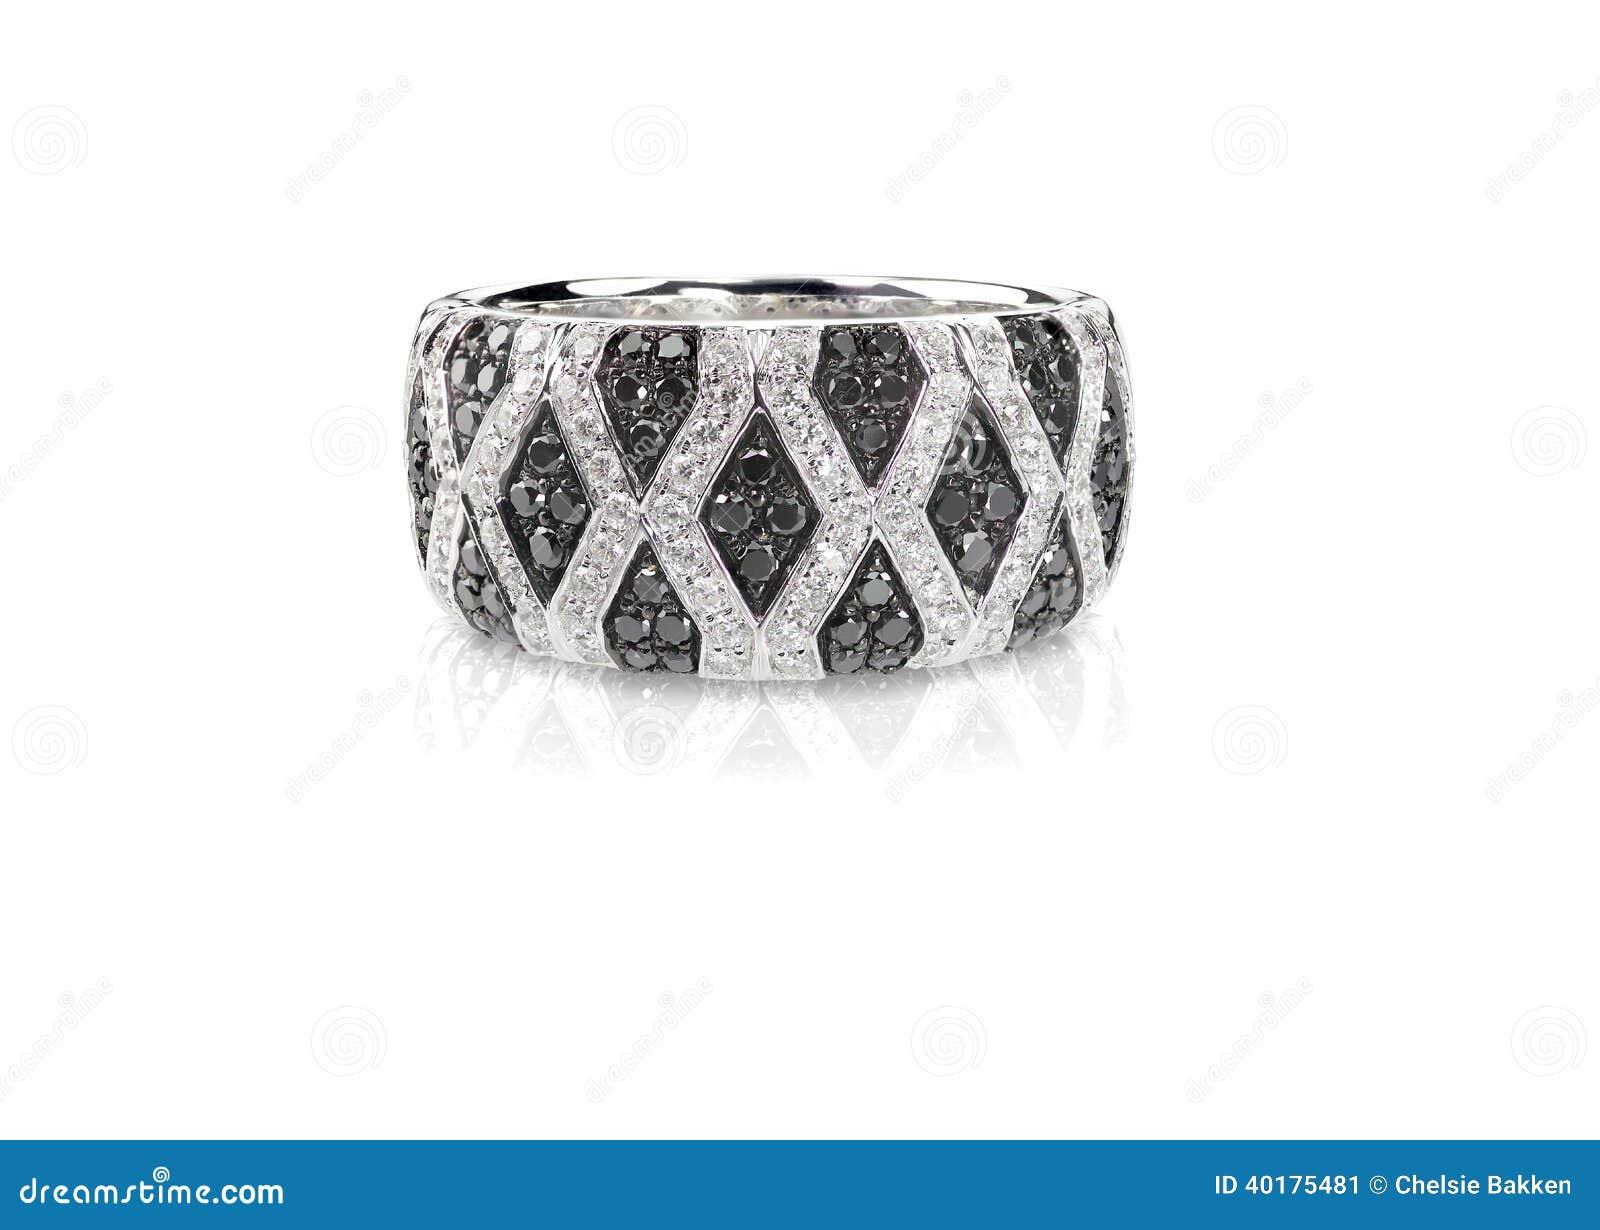 Black Onyx c black onyx wedding ring 14k Yellow Gold Halo Engagement Black Onyx Engagement Ring Diamond Accents Oval mm sizes 5